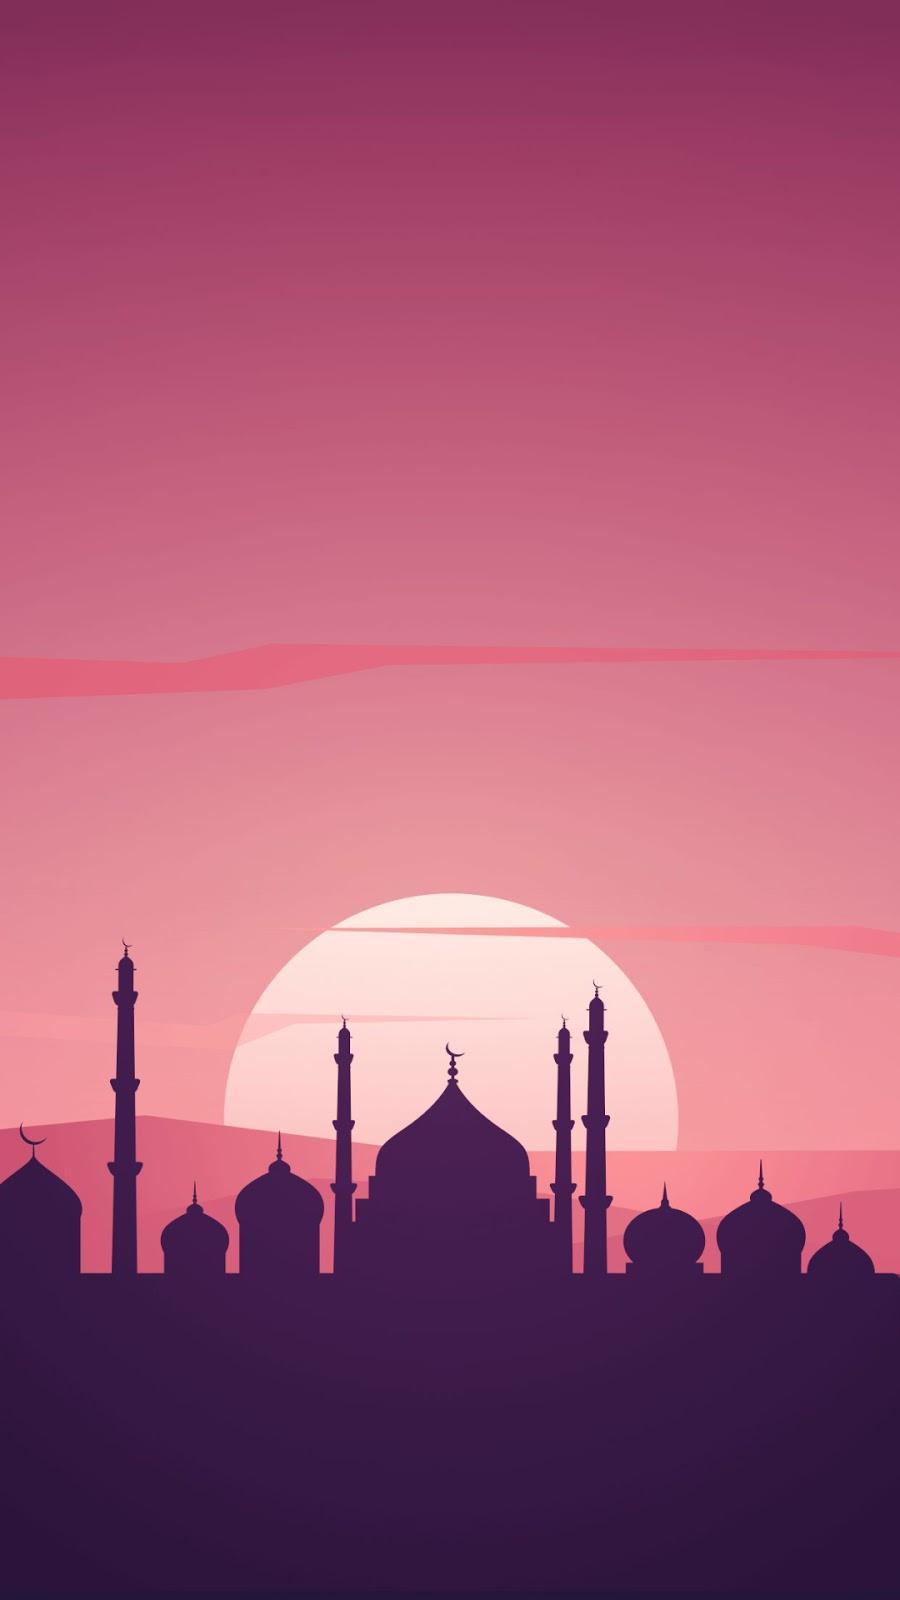 Background Ramadhan Wallpaper HD Android Polis dan Siluet Masjid